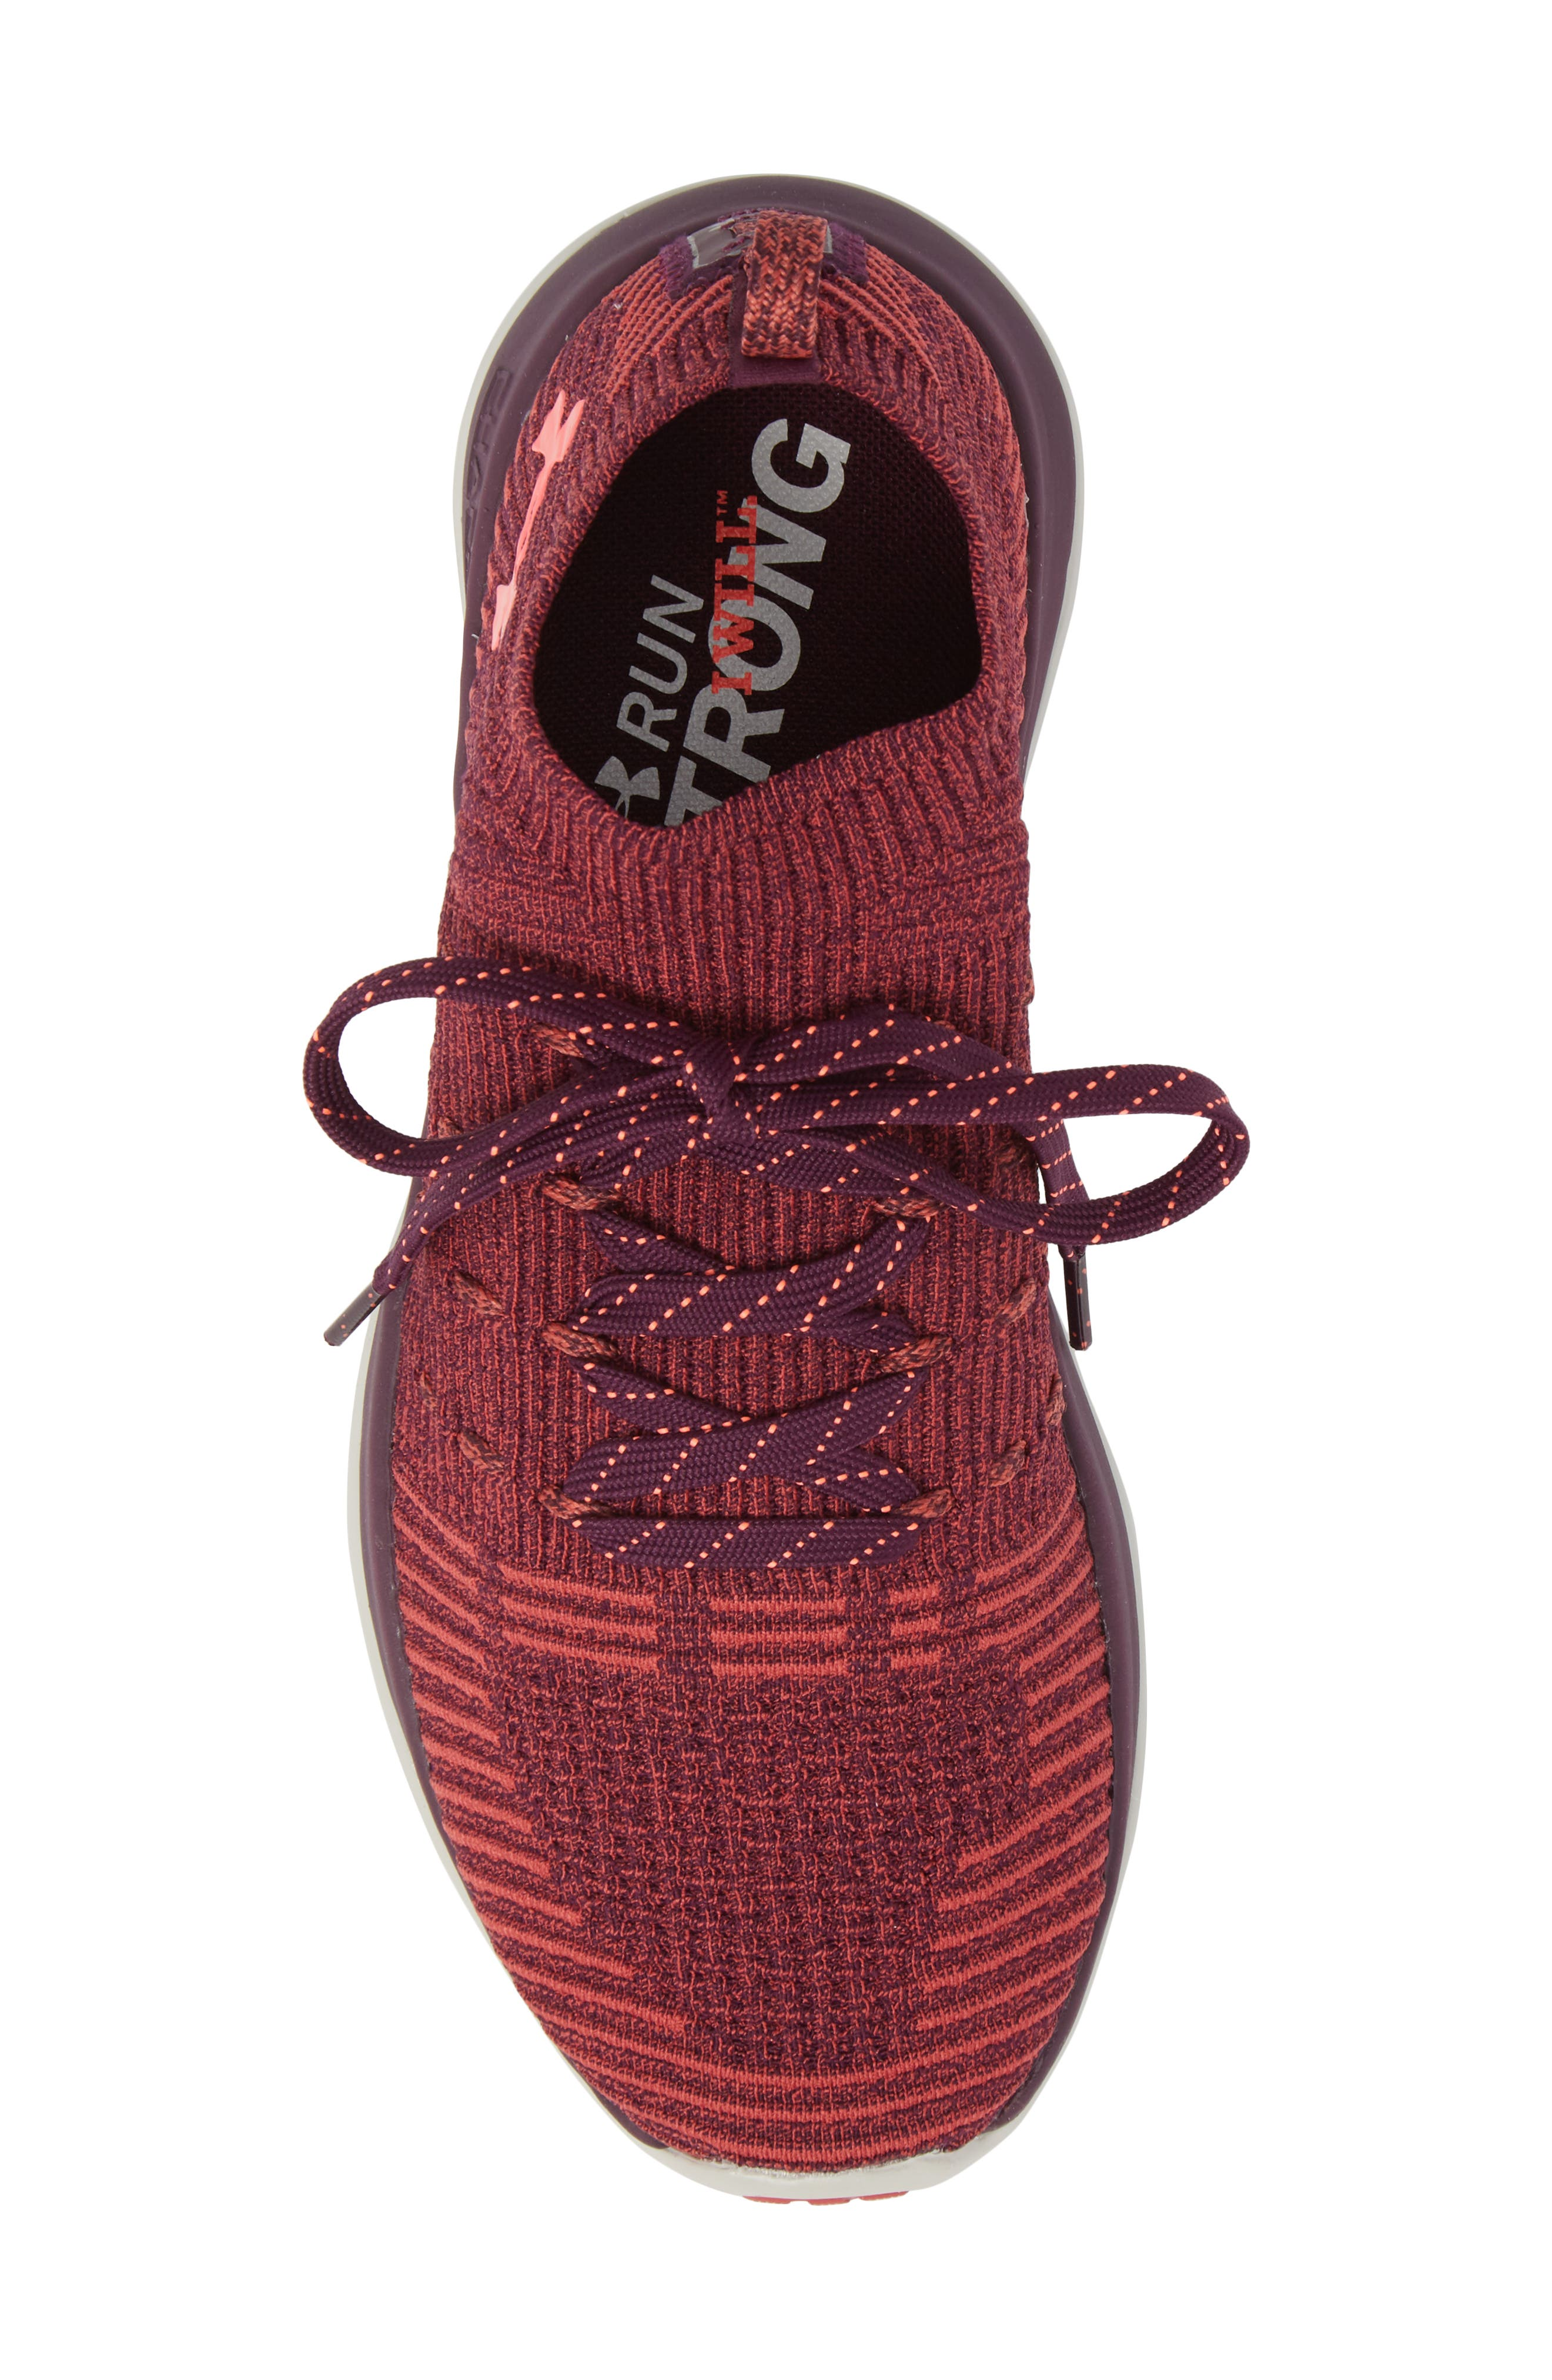 Slingflex Rise Sneaker,                             Alternate thumbnail 5, color,                             Merlot/ Rustic Red/ Brilliance